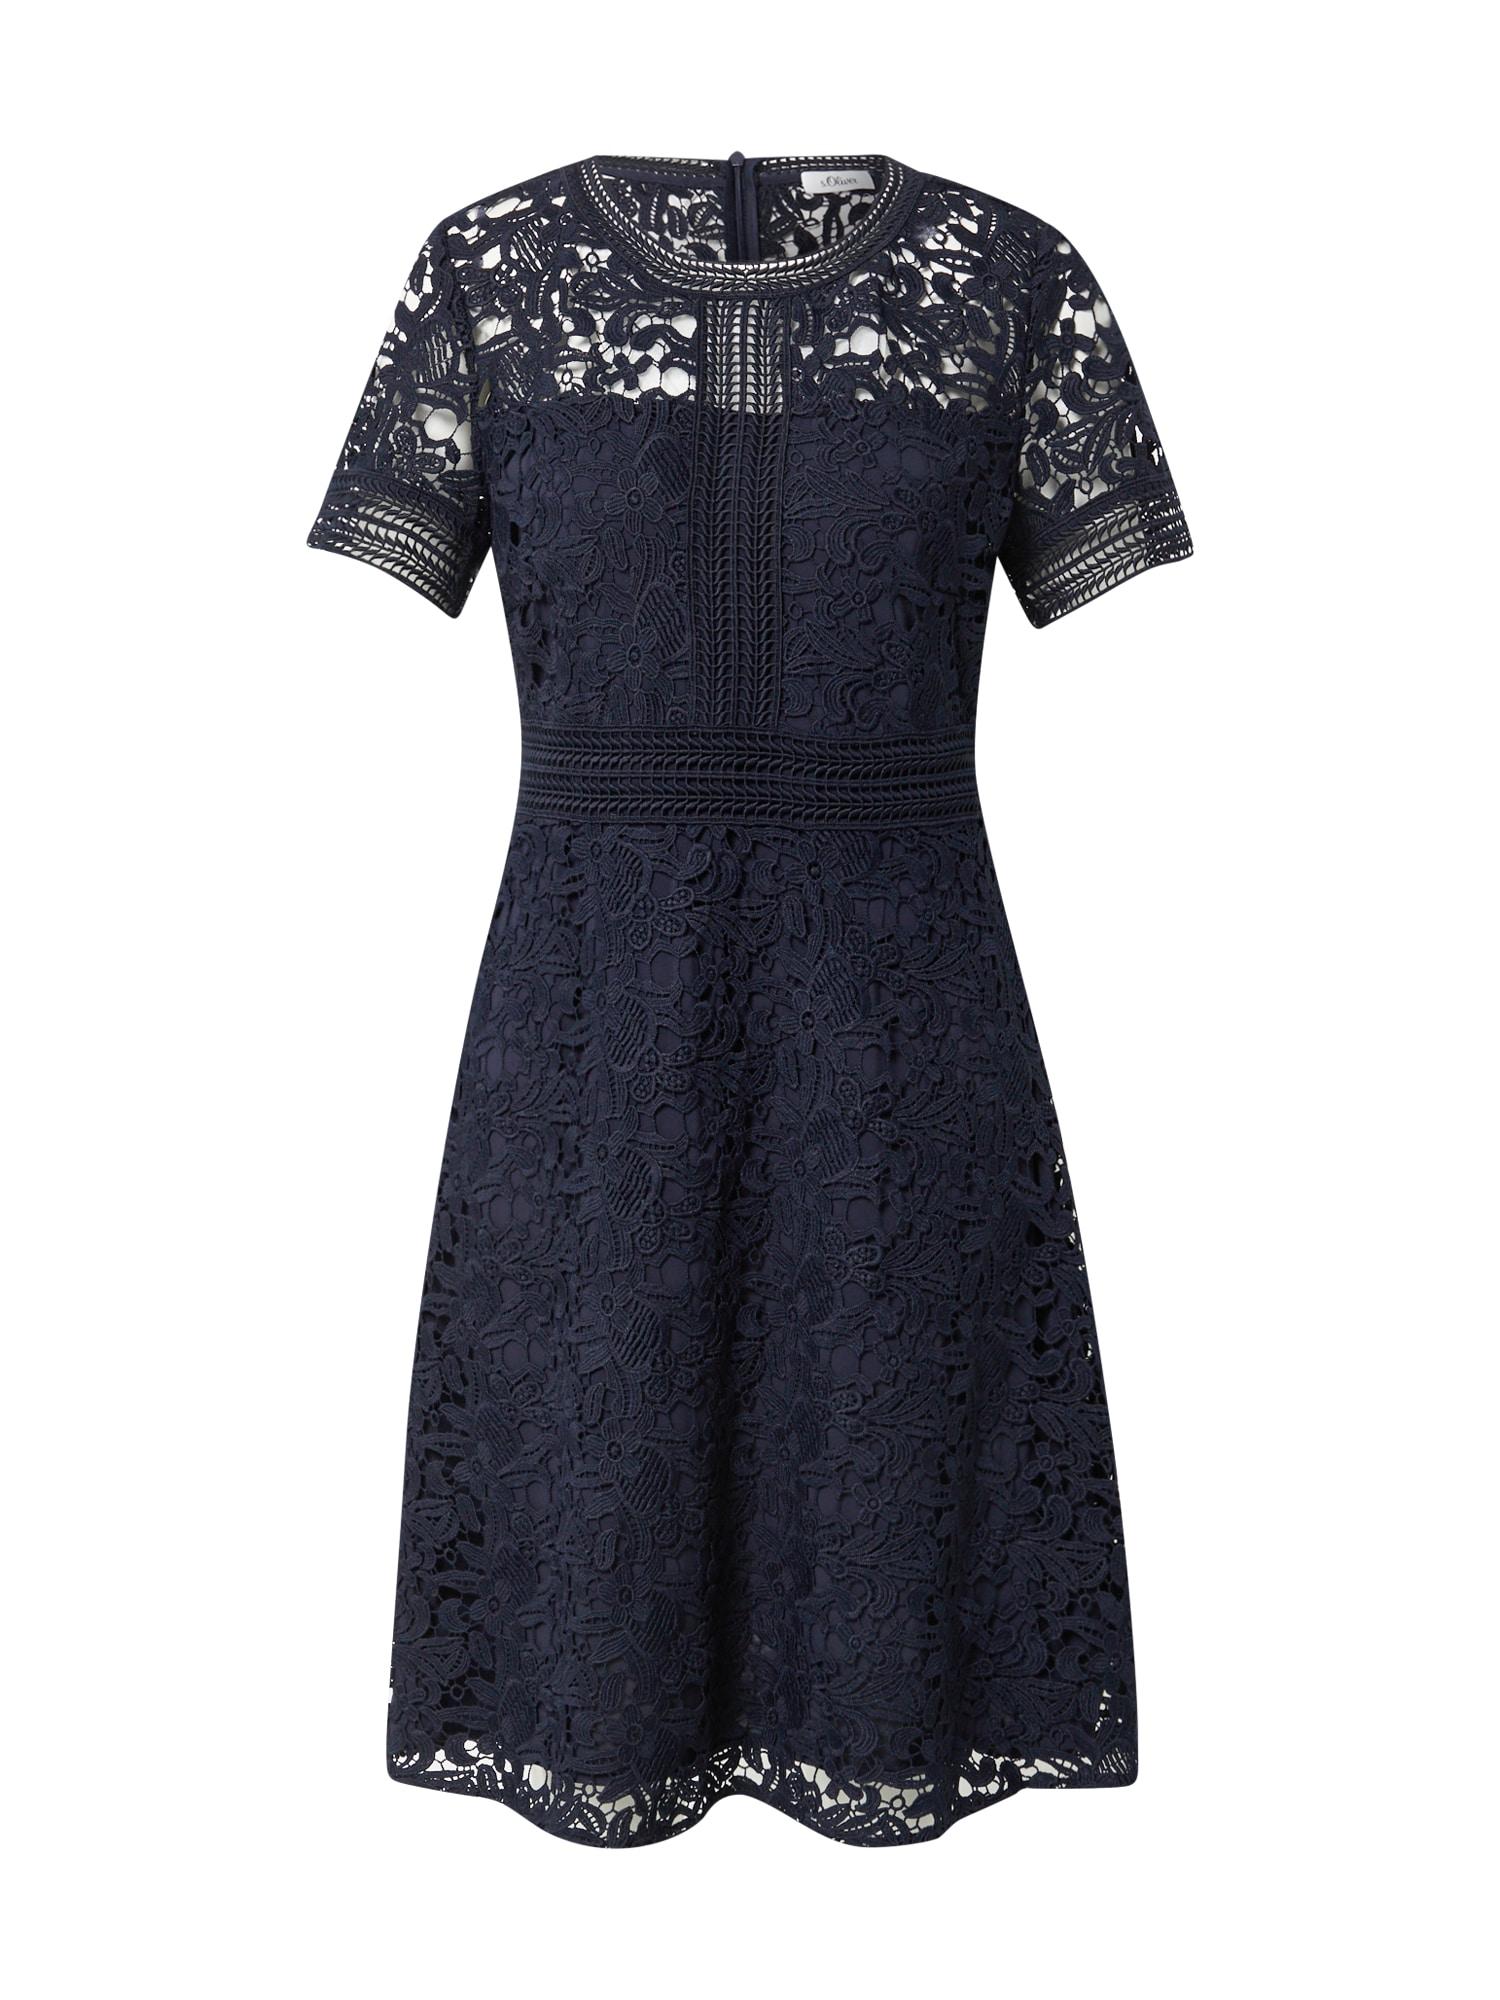 s.Oliver BLACK LABEL Kokteilinė suknelė tamsiai mėlyna